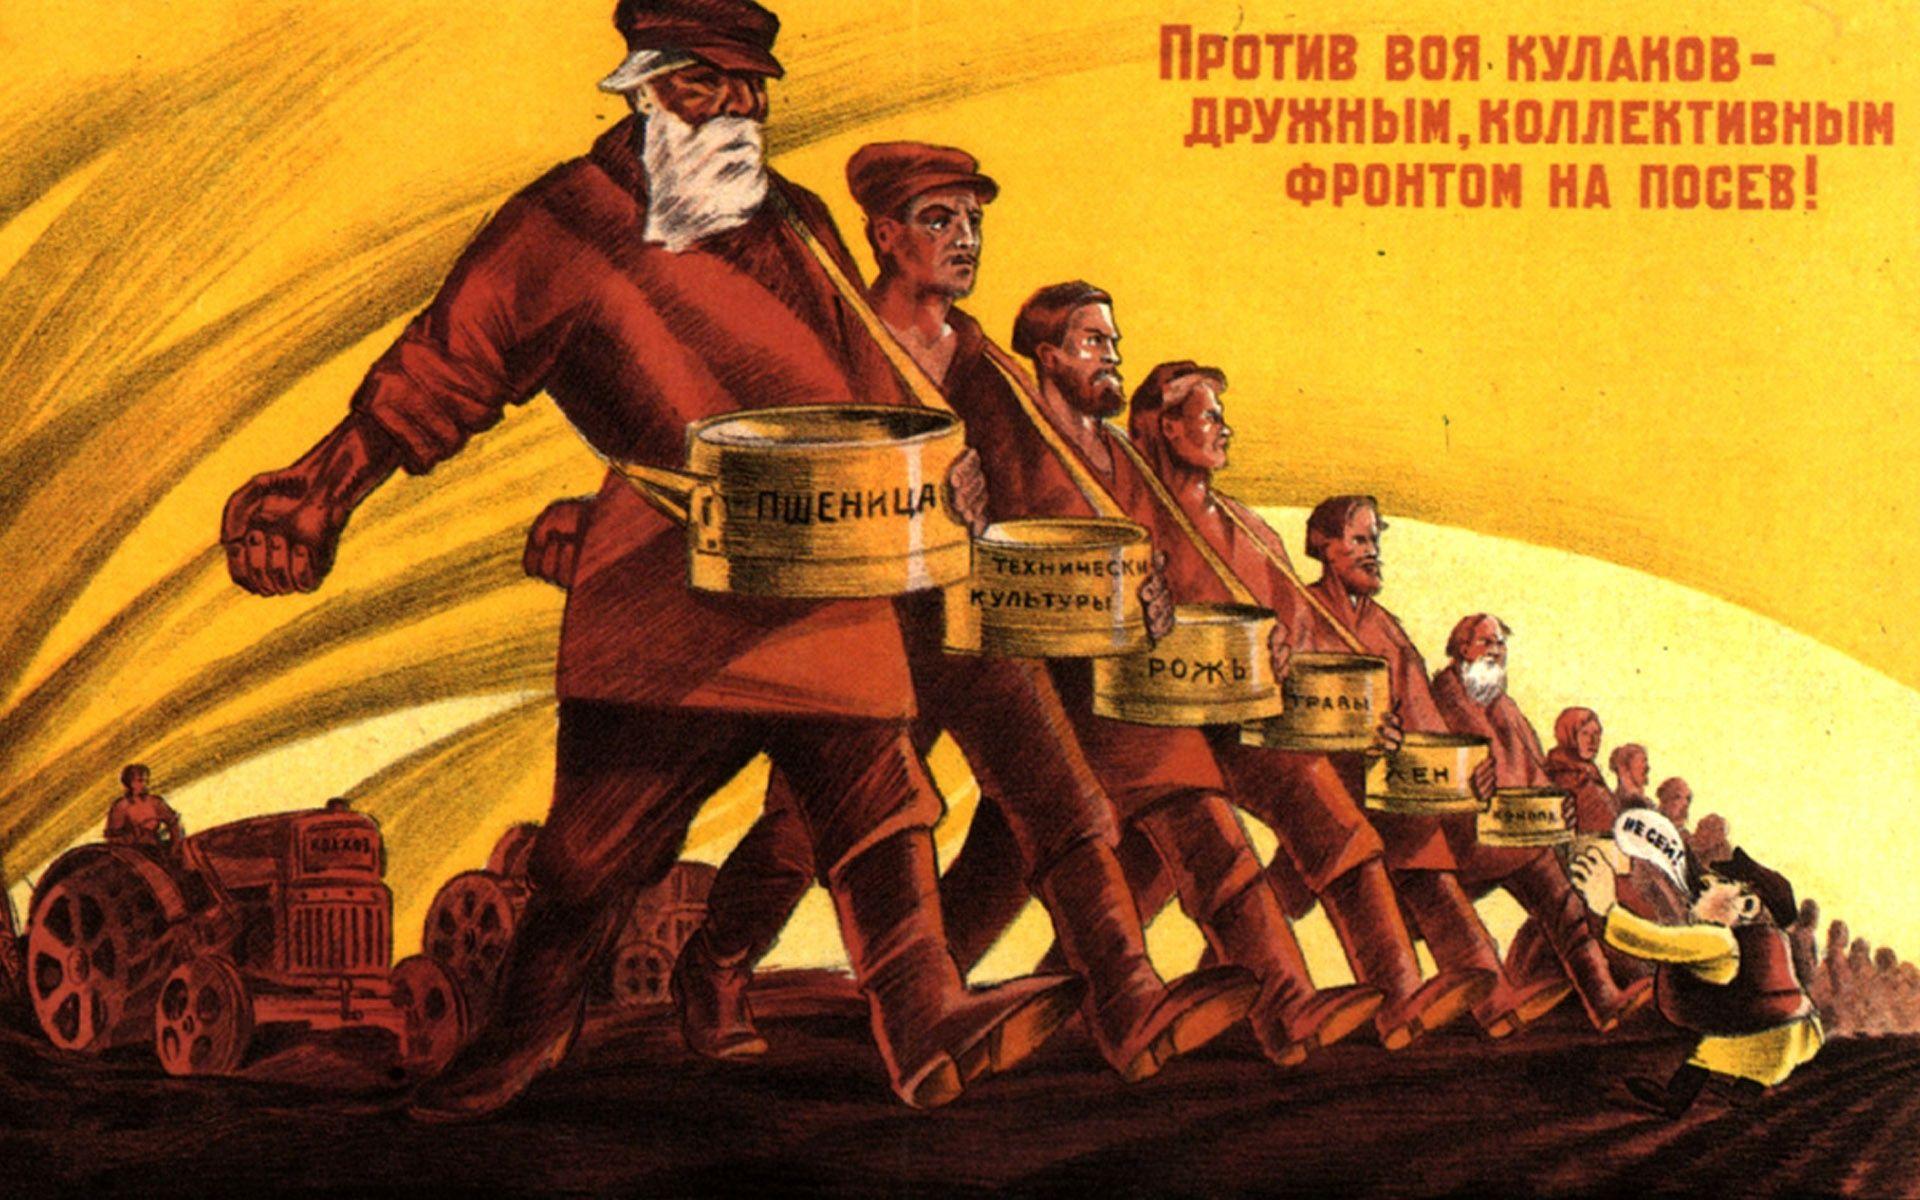 Soviet Union Propaganda